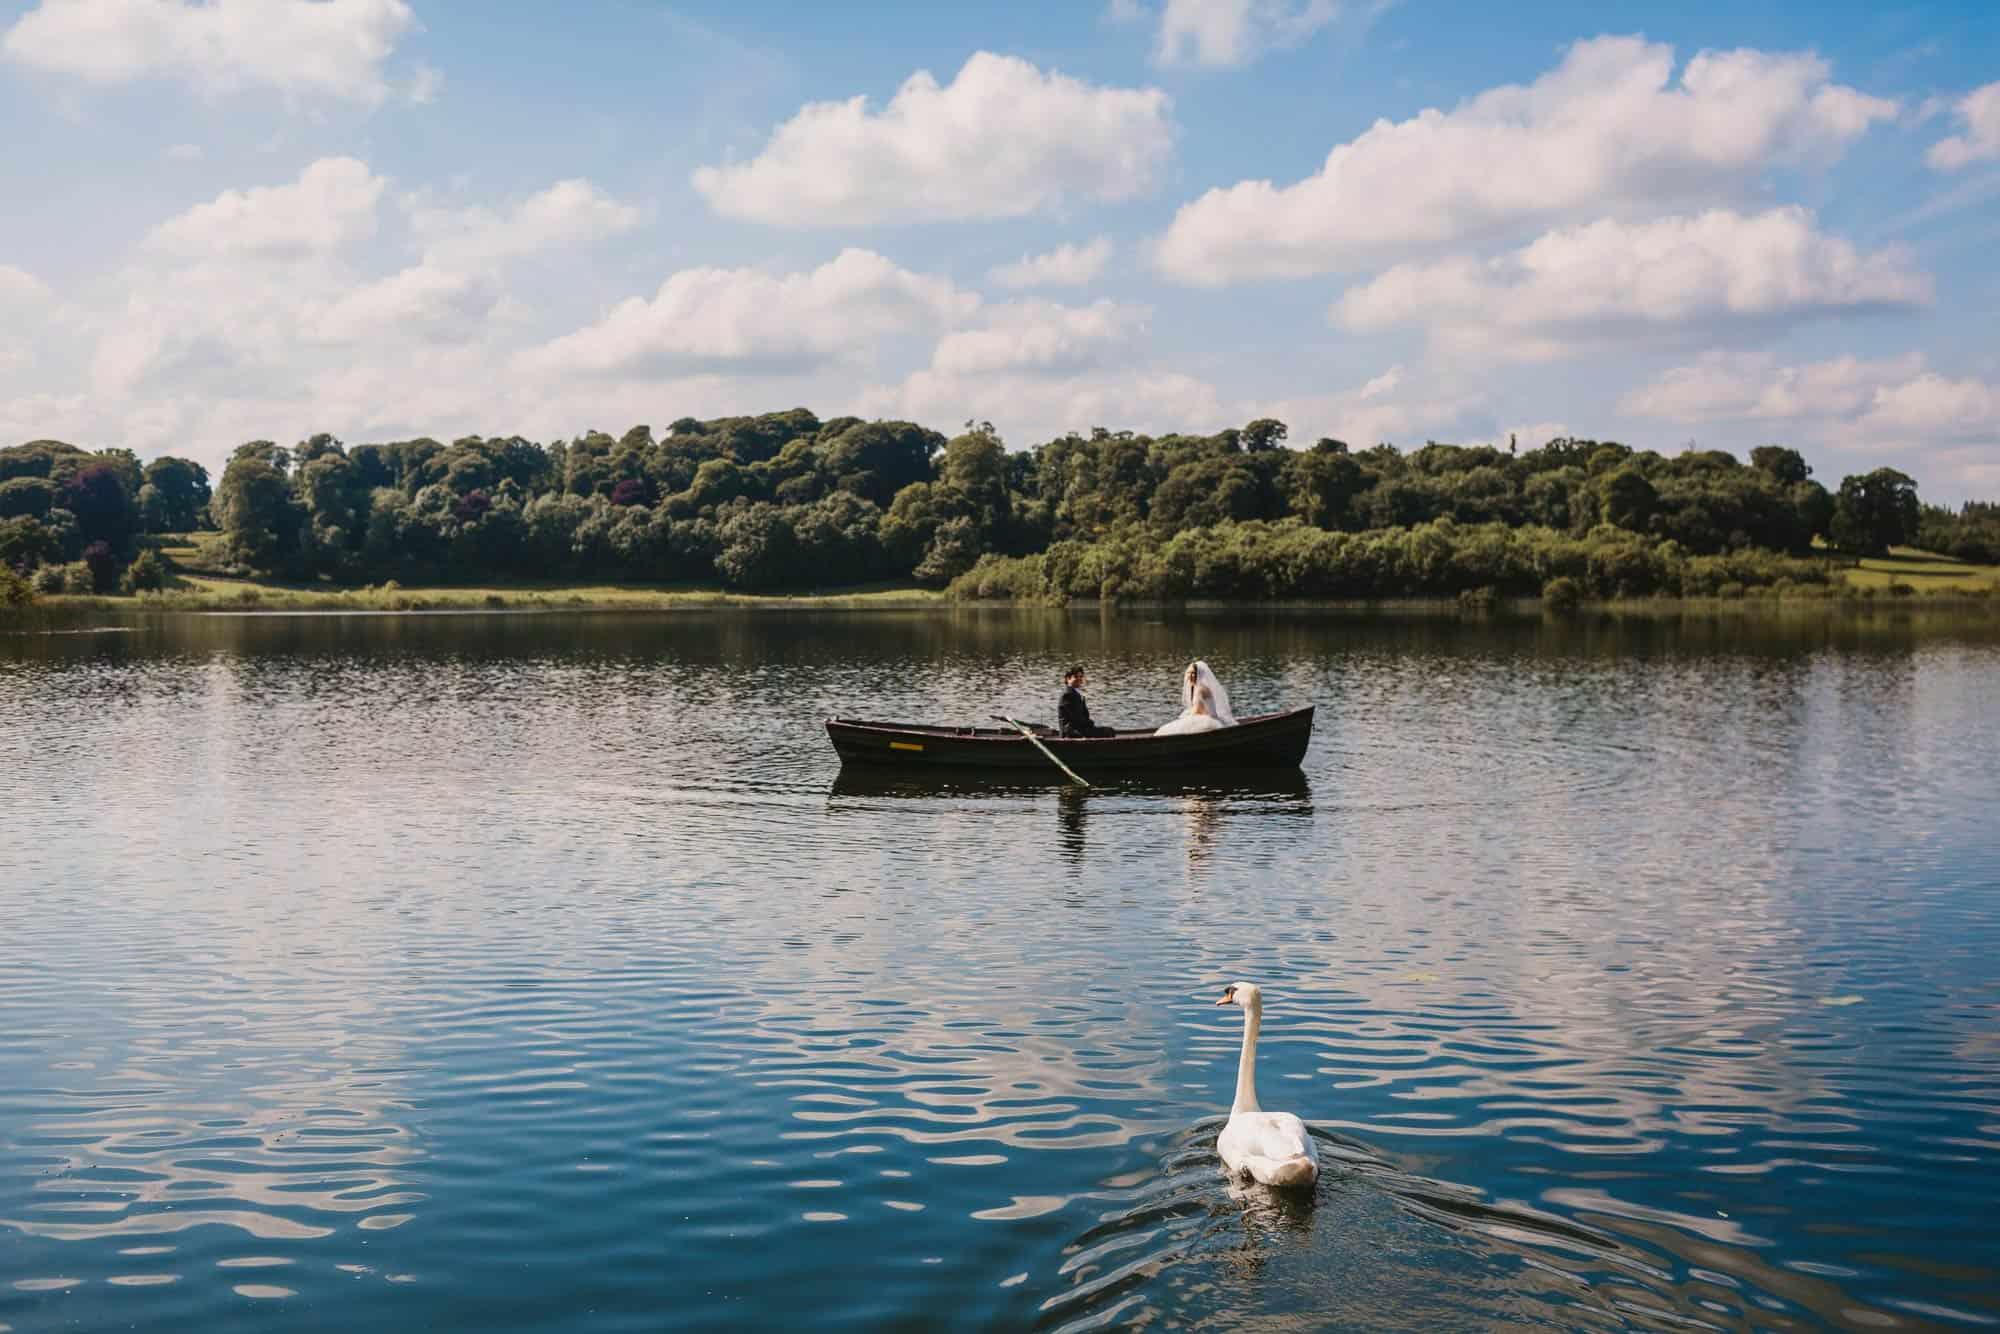 Dromoland Castle Ireland, couple still on boat